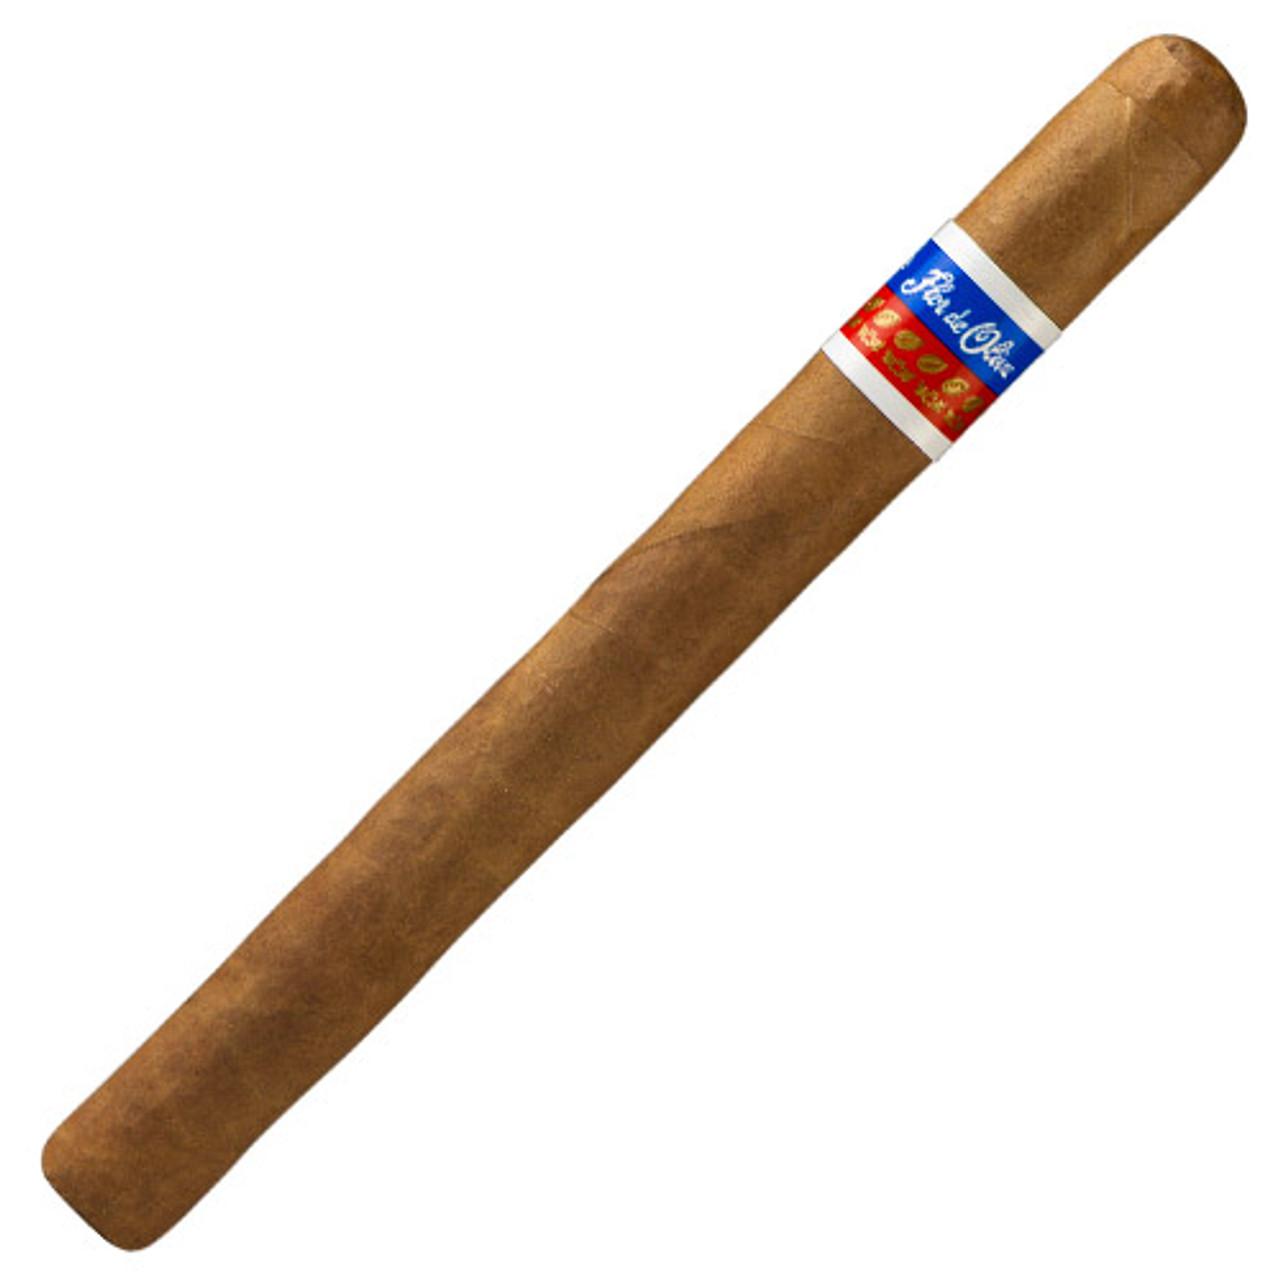 Flor de Oliva Presidente Cigars - 8 x 52 (Box of 20)